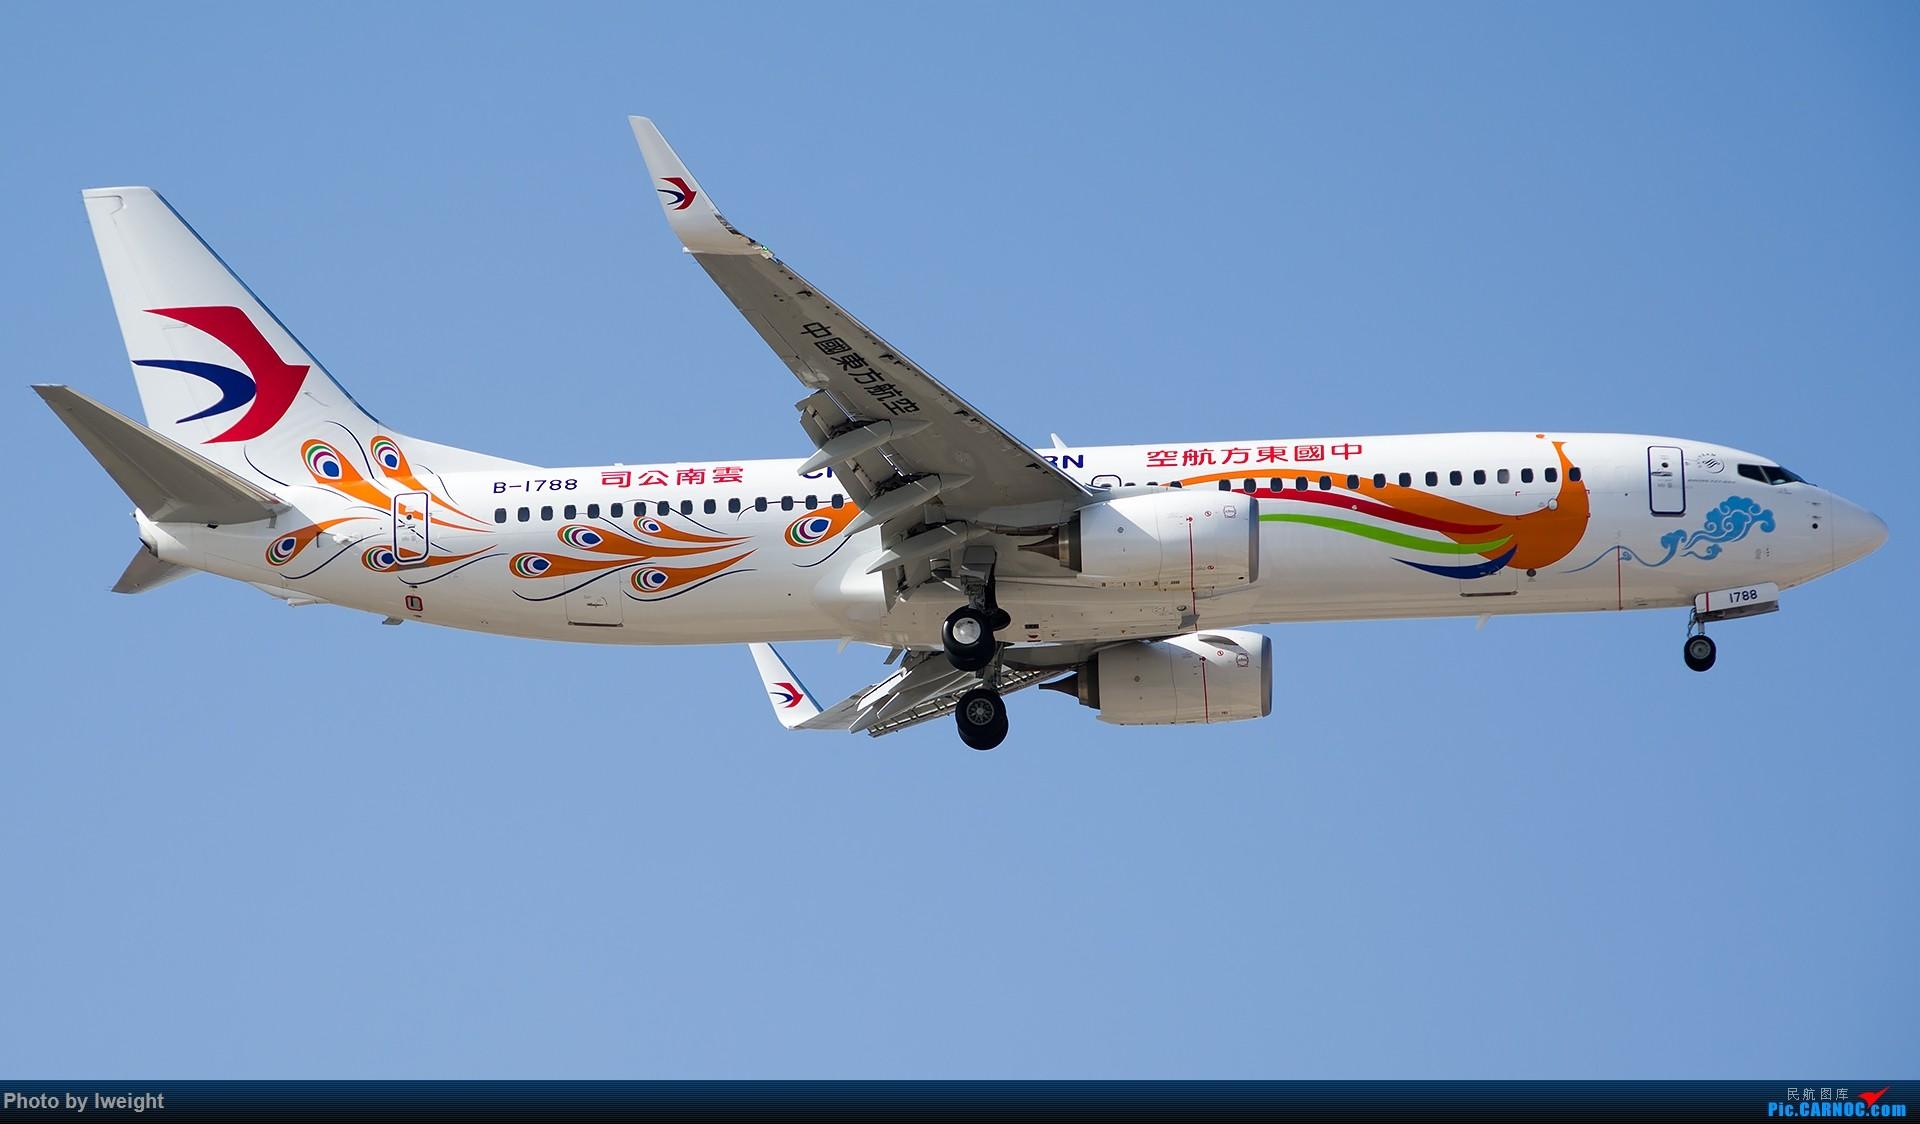 Re:[原创]羊年第一次拍机,首都机场[2015-2-23] BOEING 737-800 B-1788 中国北京首都国际机场